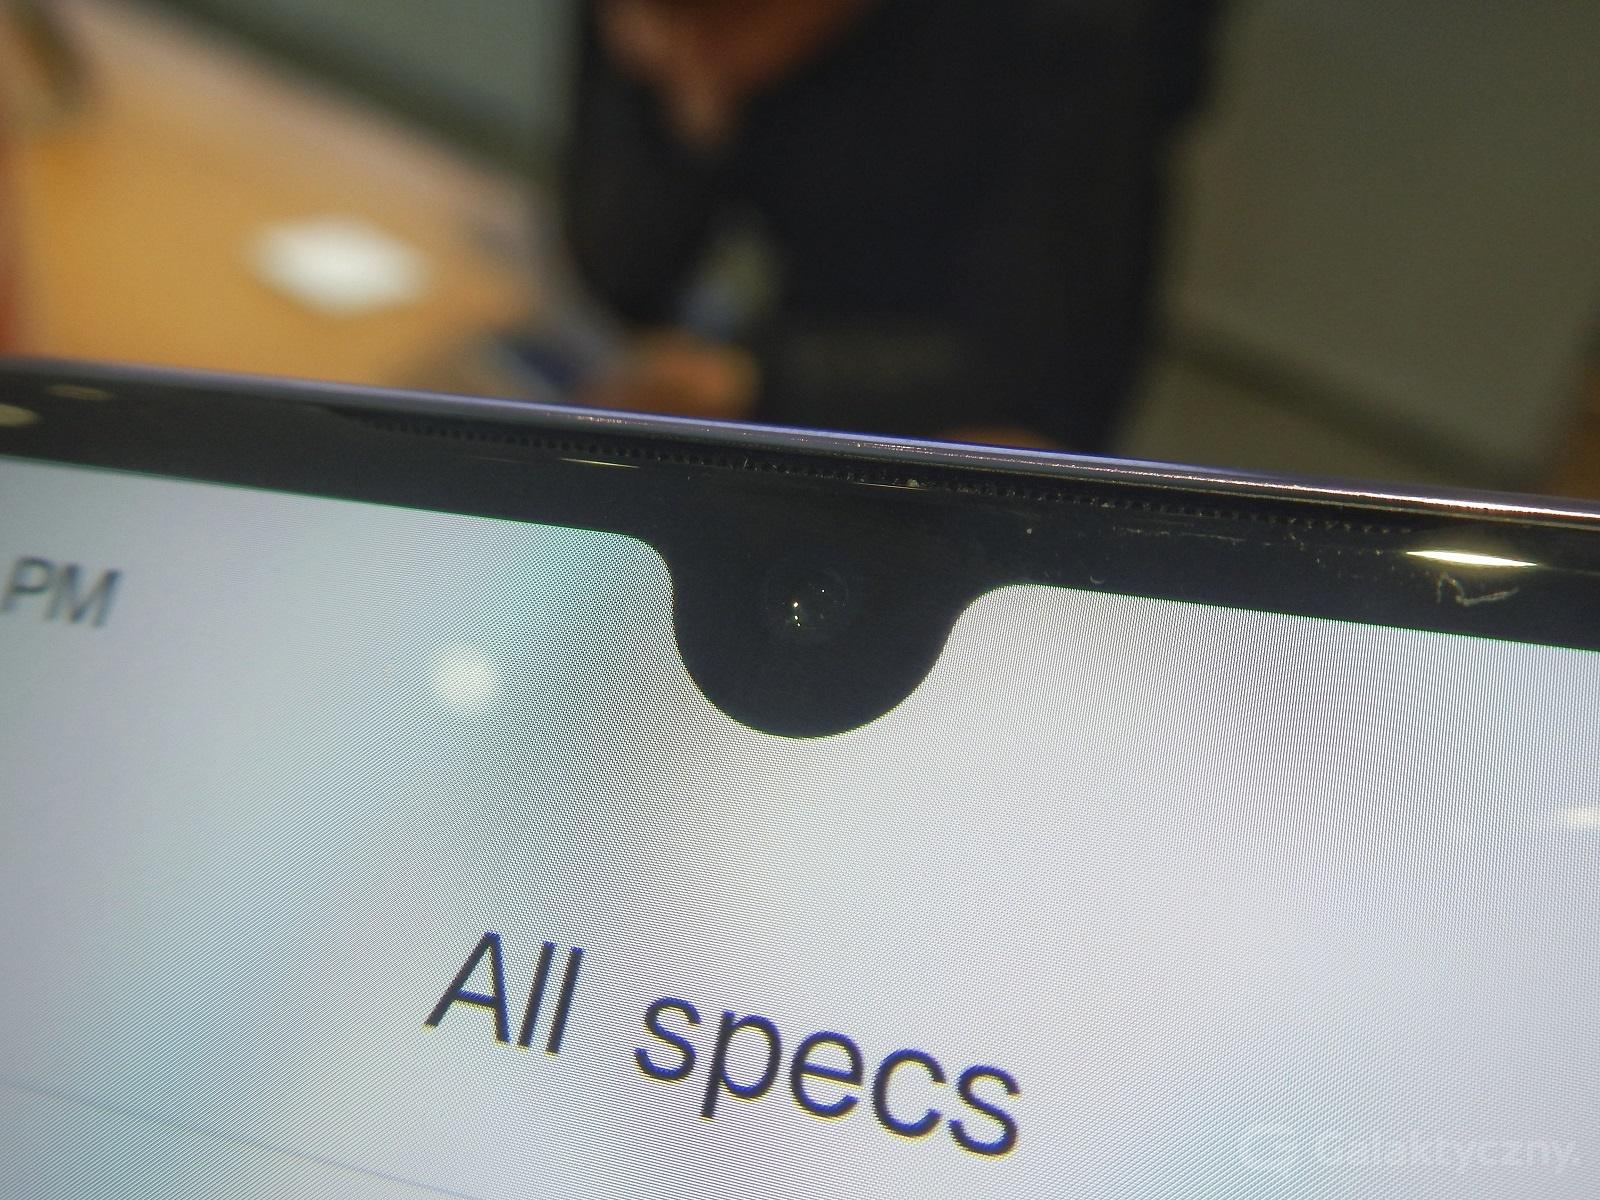 Xiaomi Mi 9 - notch